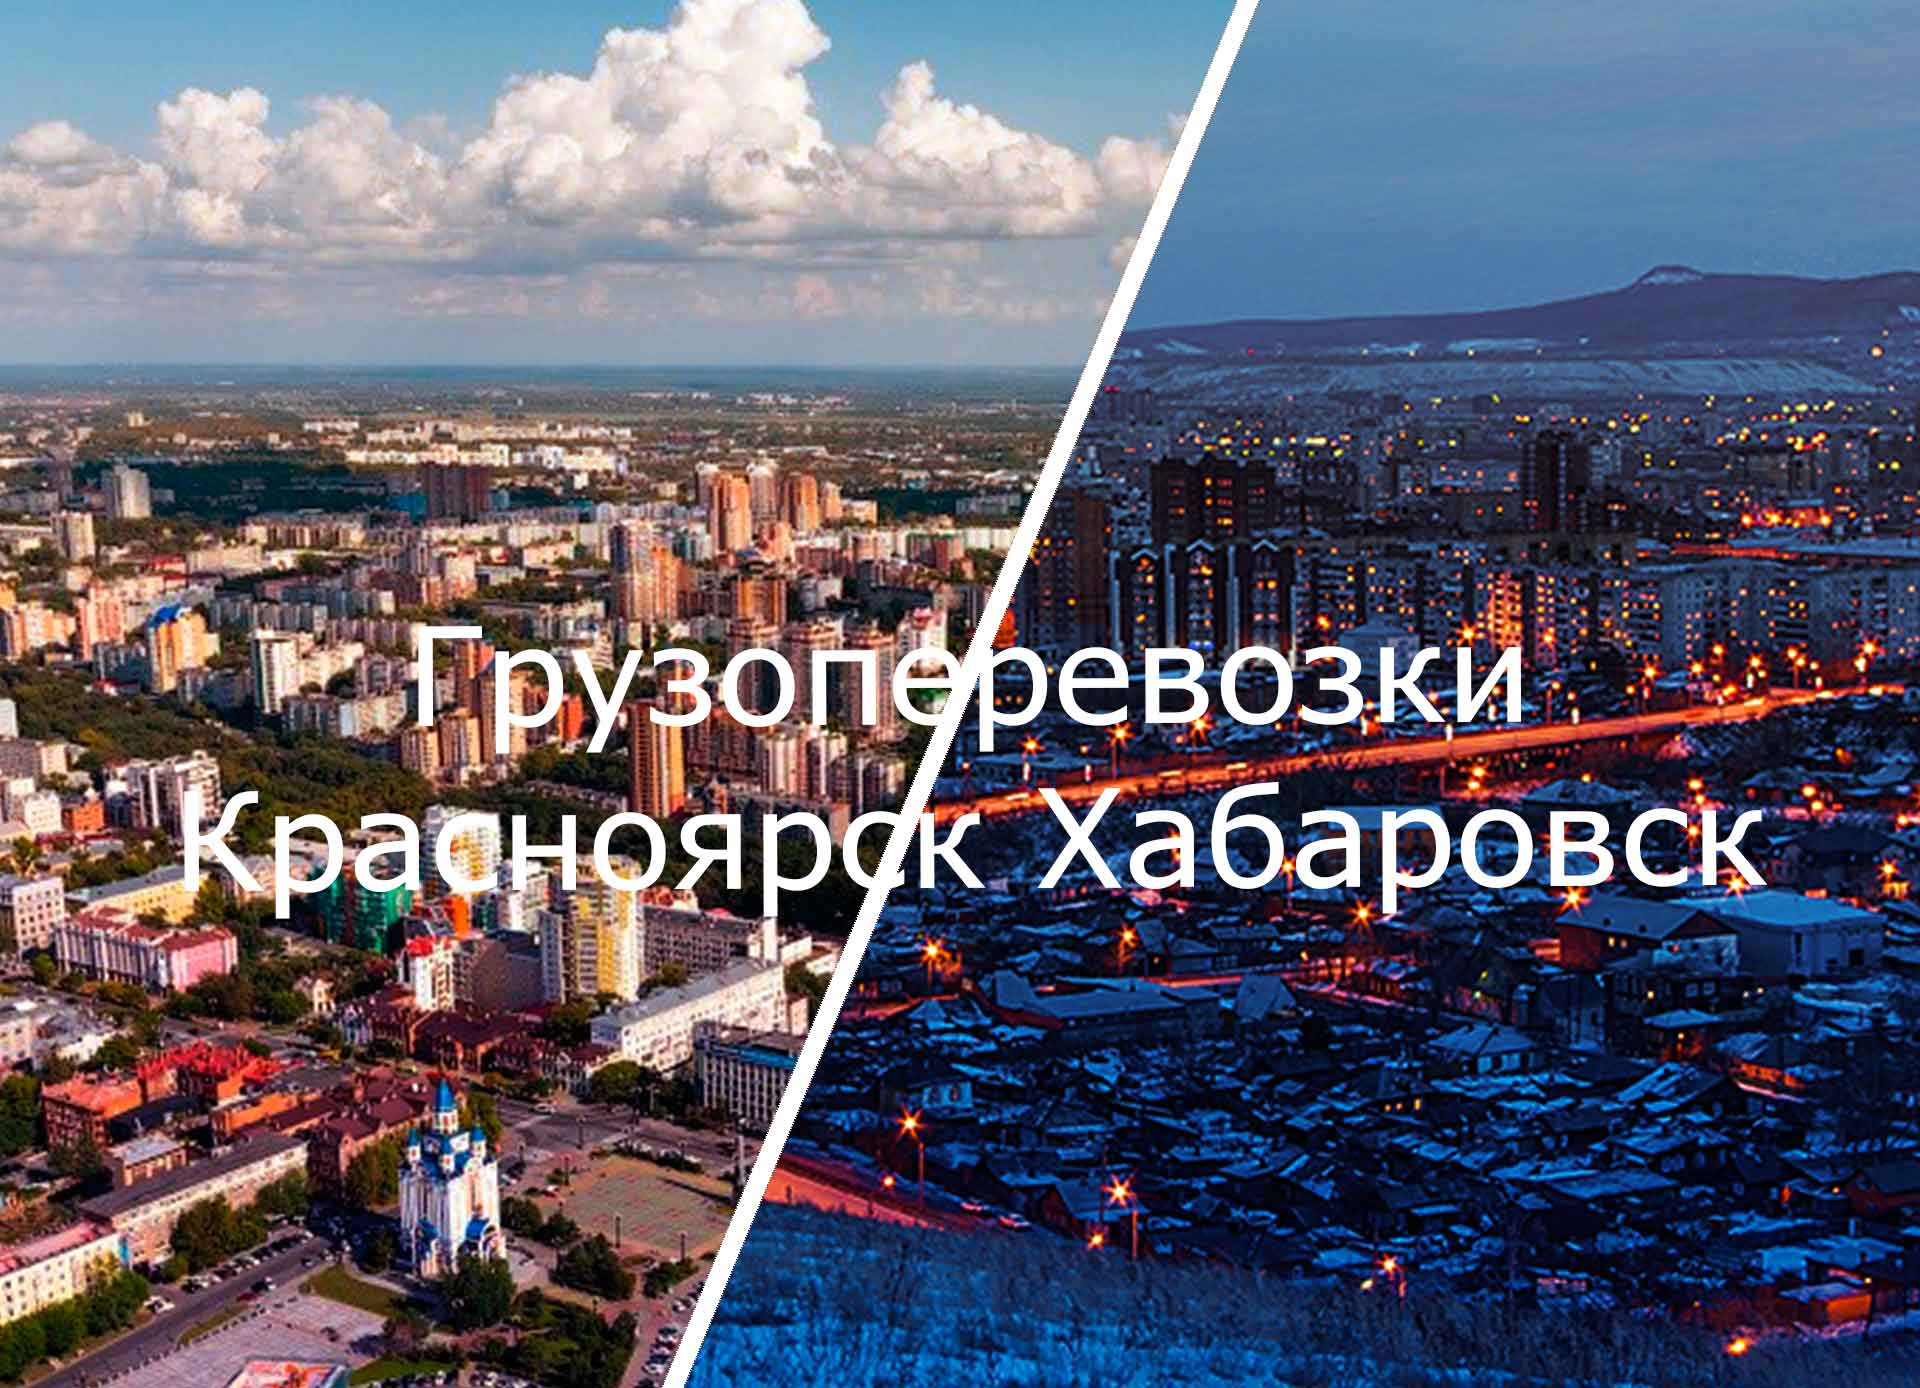 грузоперевозки красноярск хабаровск